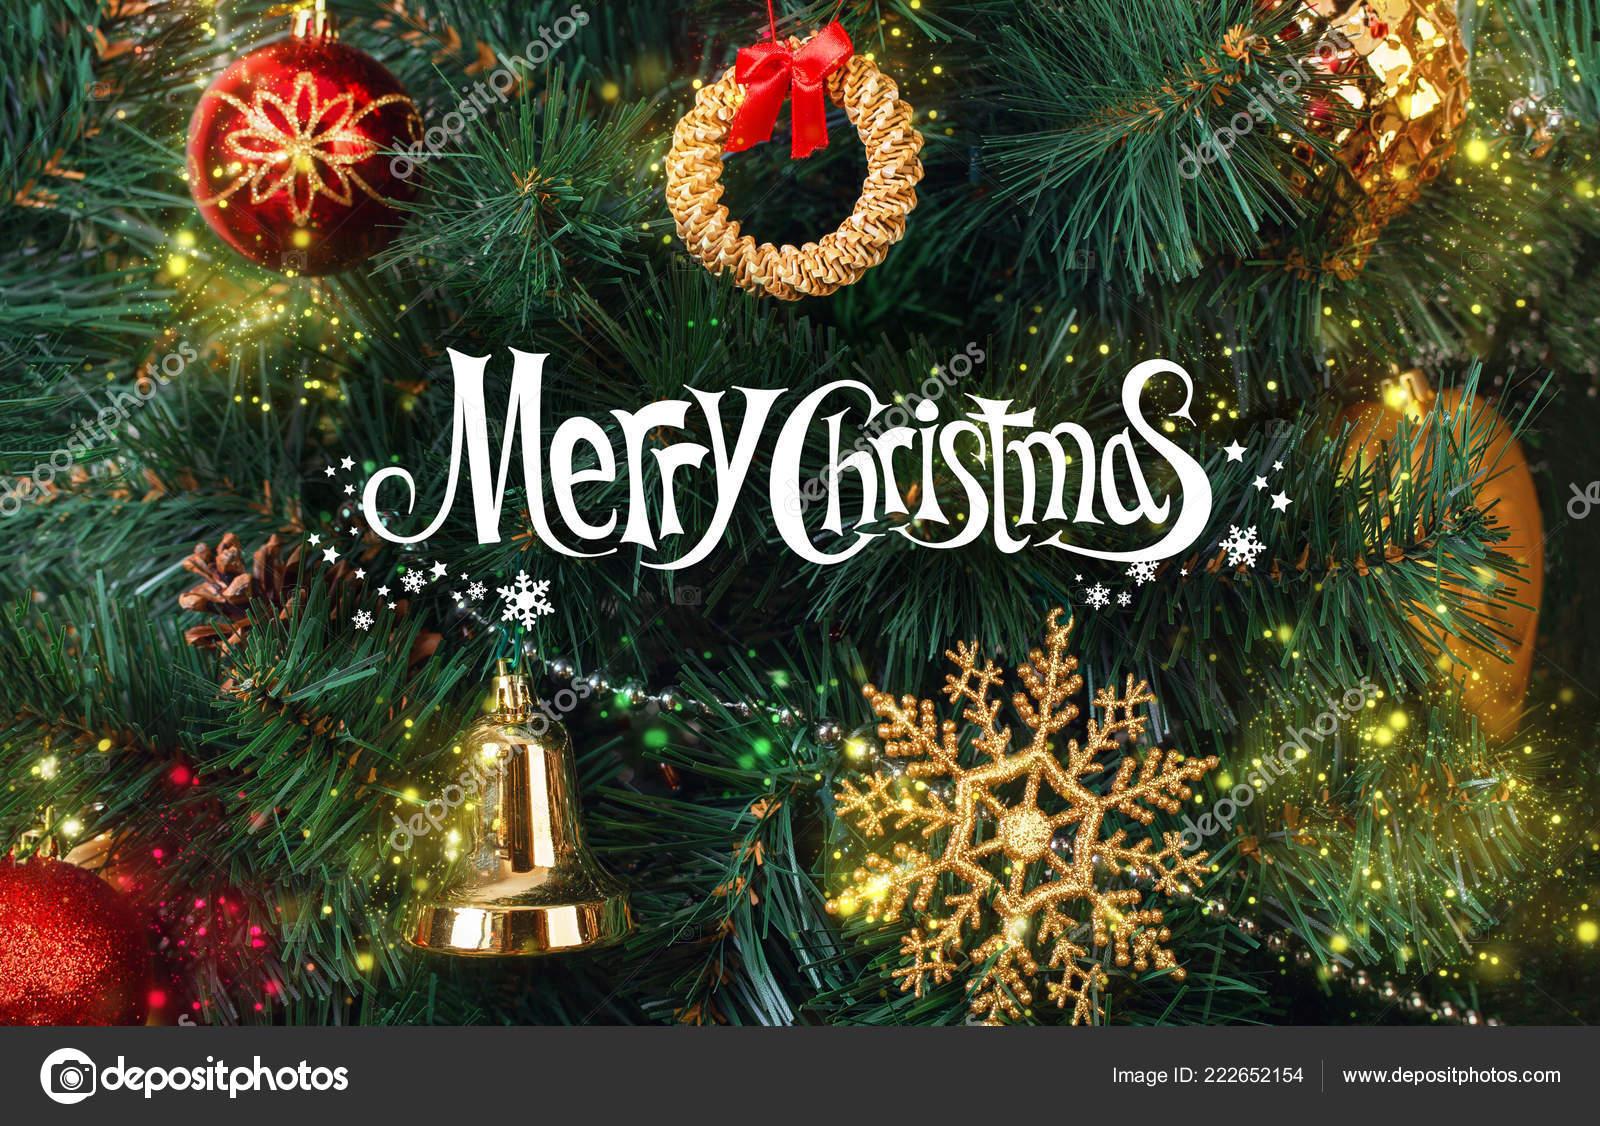 Greeting Card Wish Merry Christmas